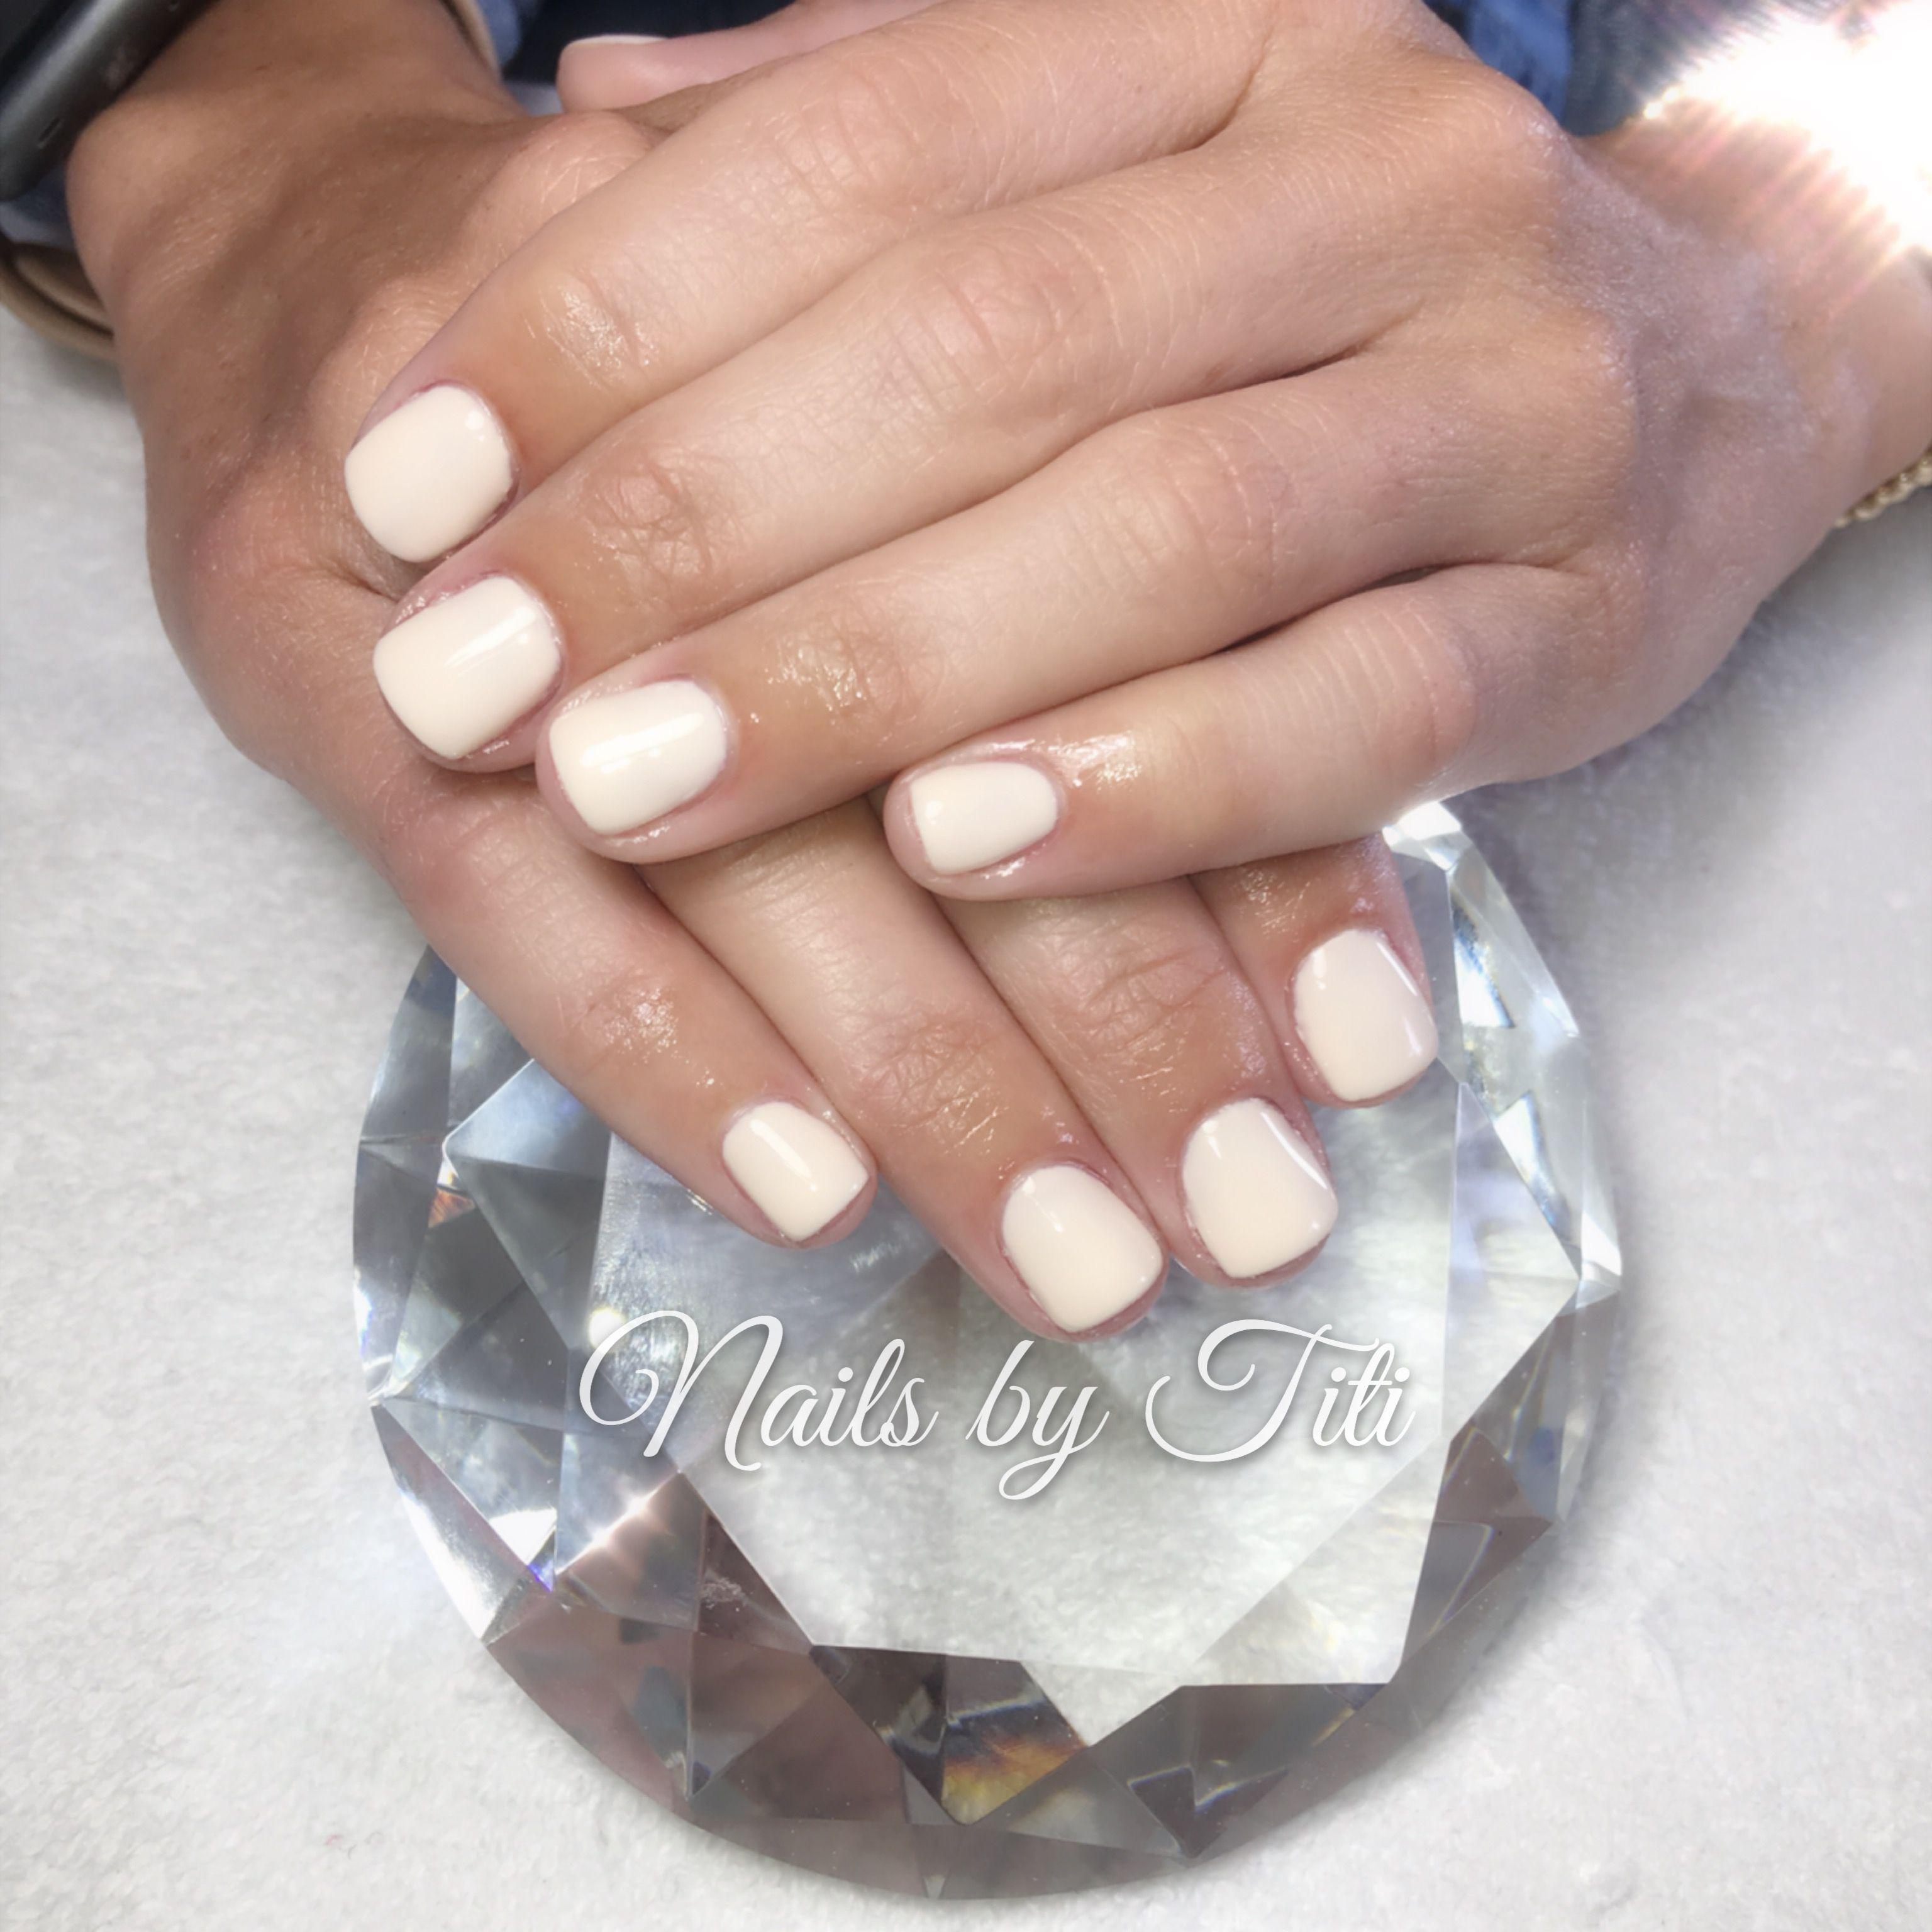 Pin by Tomoyuki & Co on Nails   Nails, Beauty